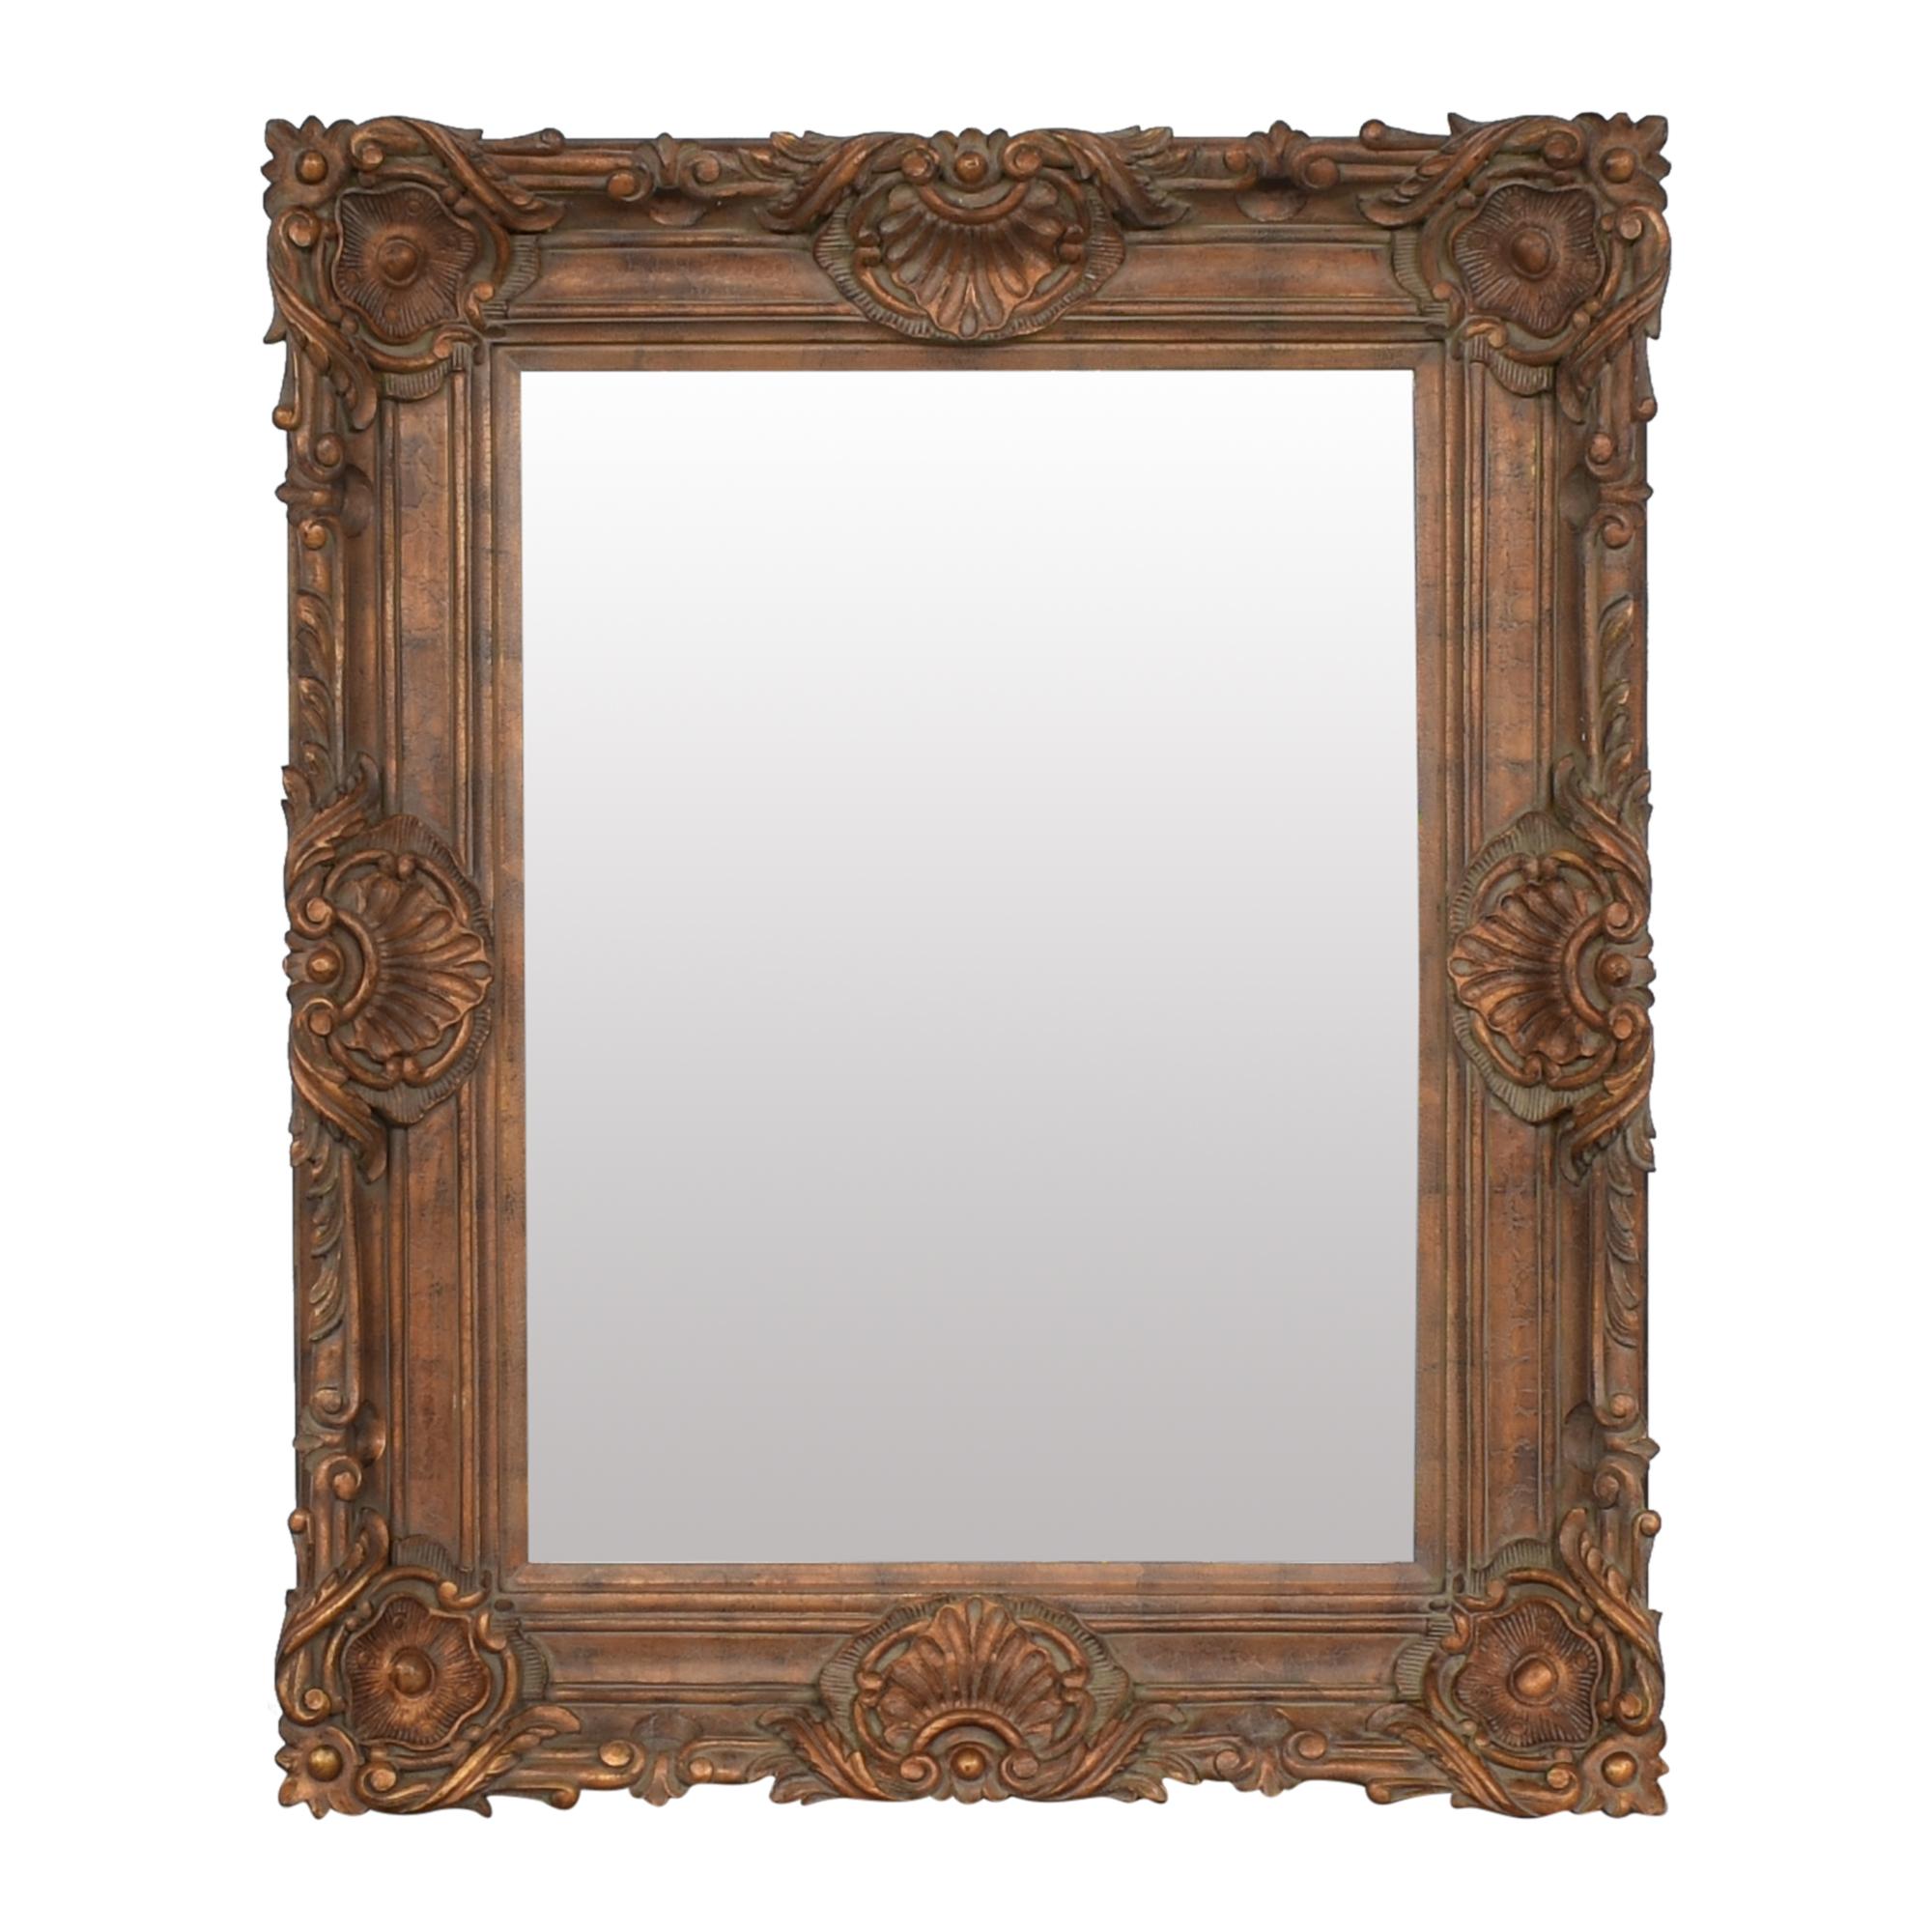 John-Richard John-Richard Large Wall Mirror used